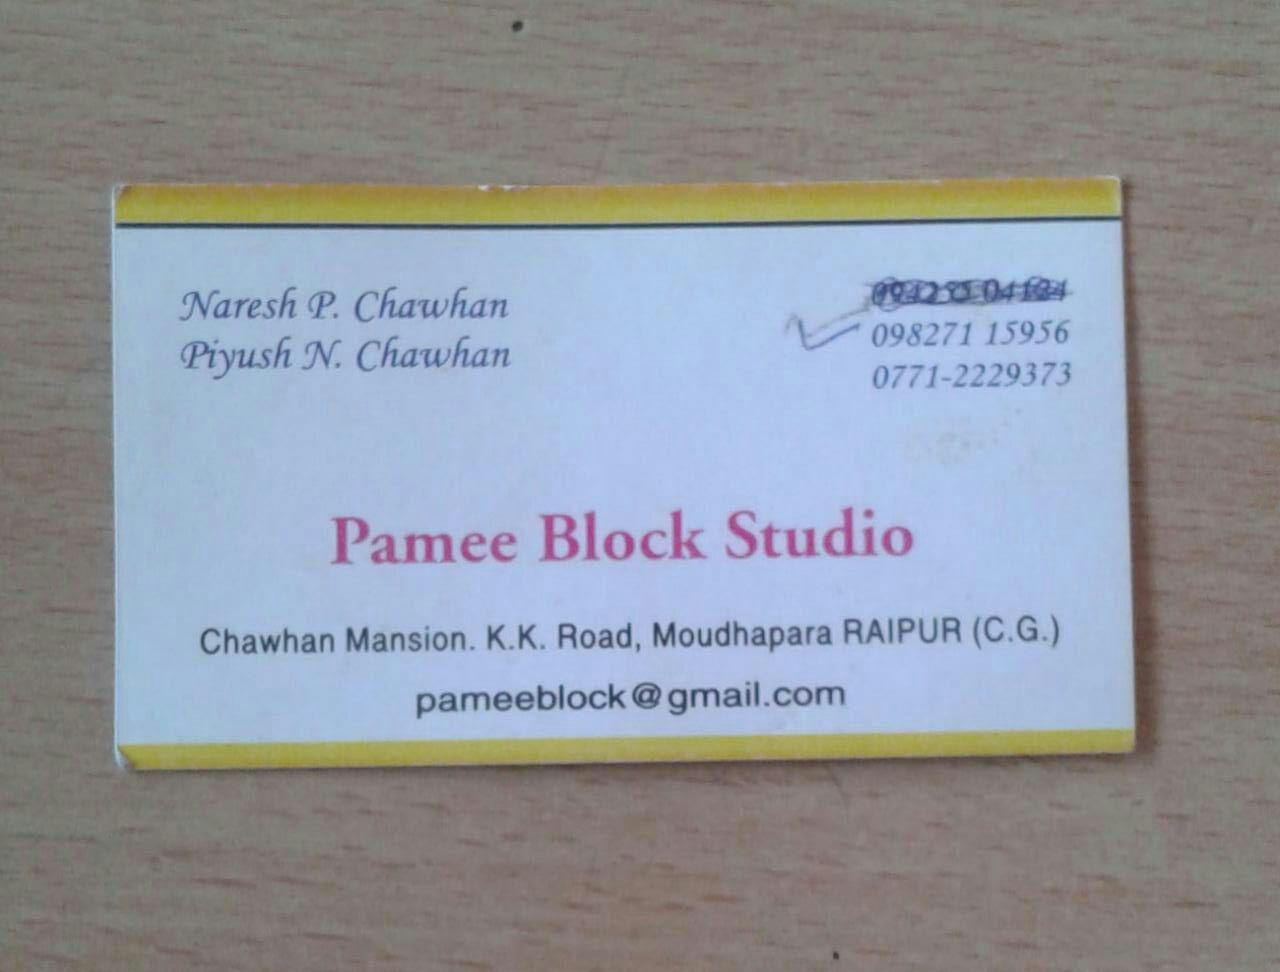 Prema Block Studio